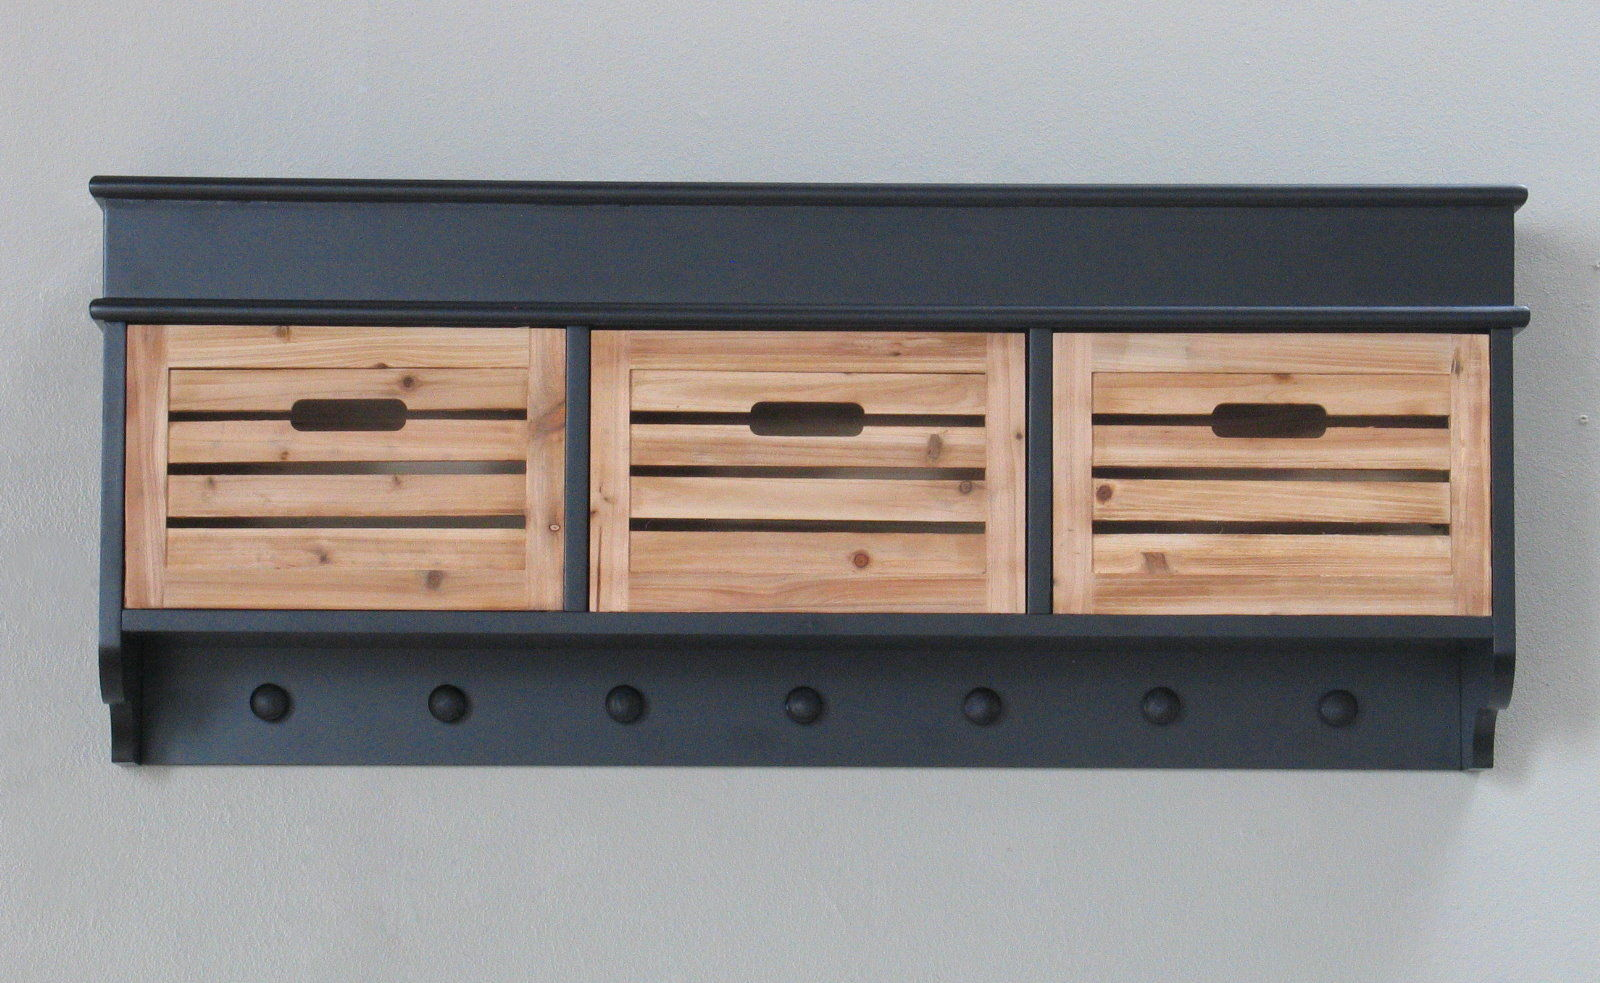 flur garderobe anna 3 holzkisten dielen wandgarderobe wandregal regal schwarz dynamic. Black Bedroom Furniture Sets. Home Design Ideas